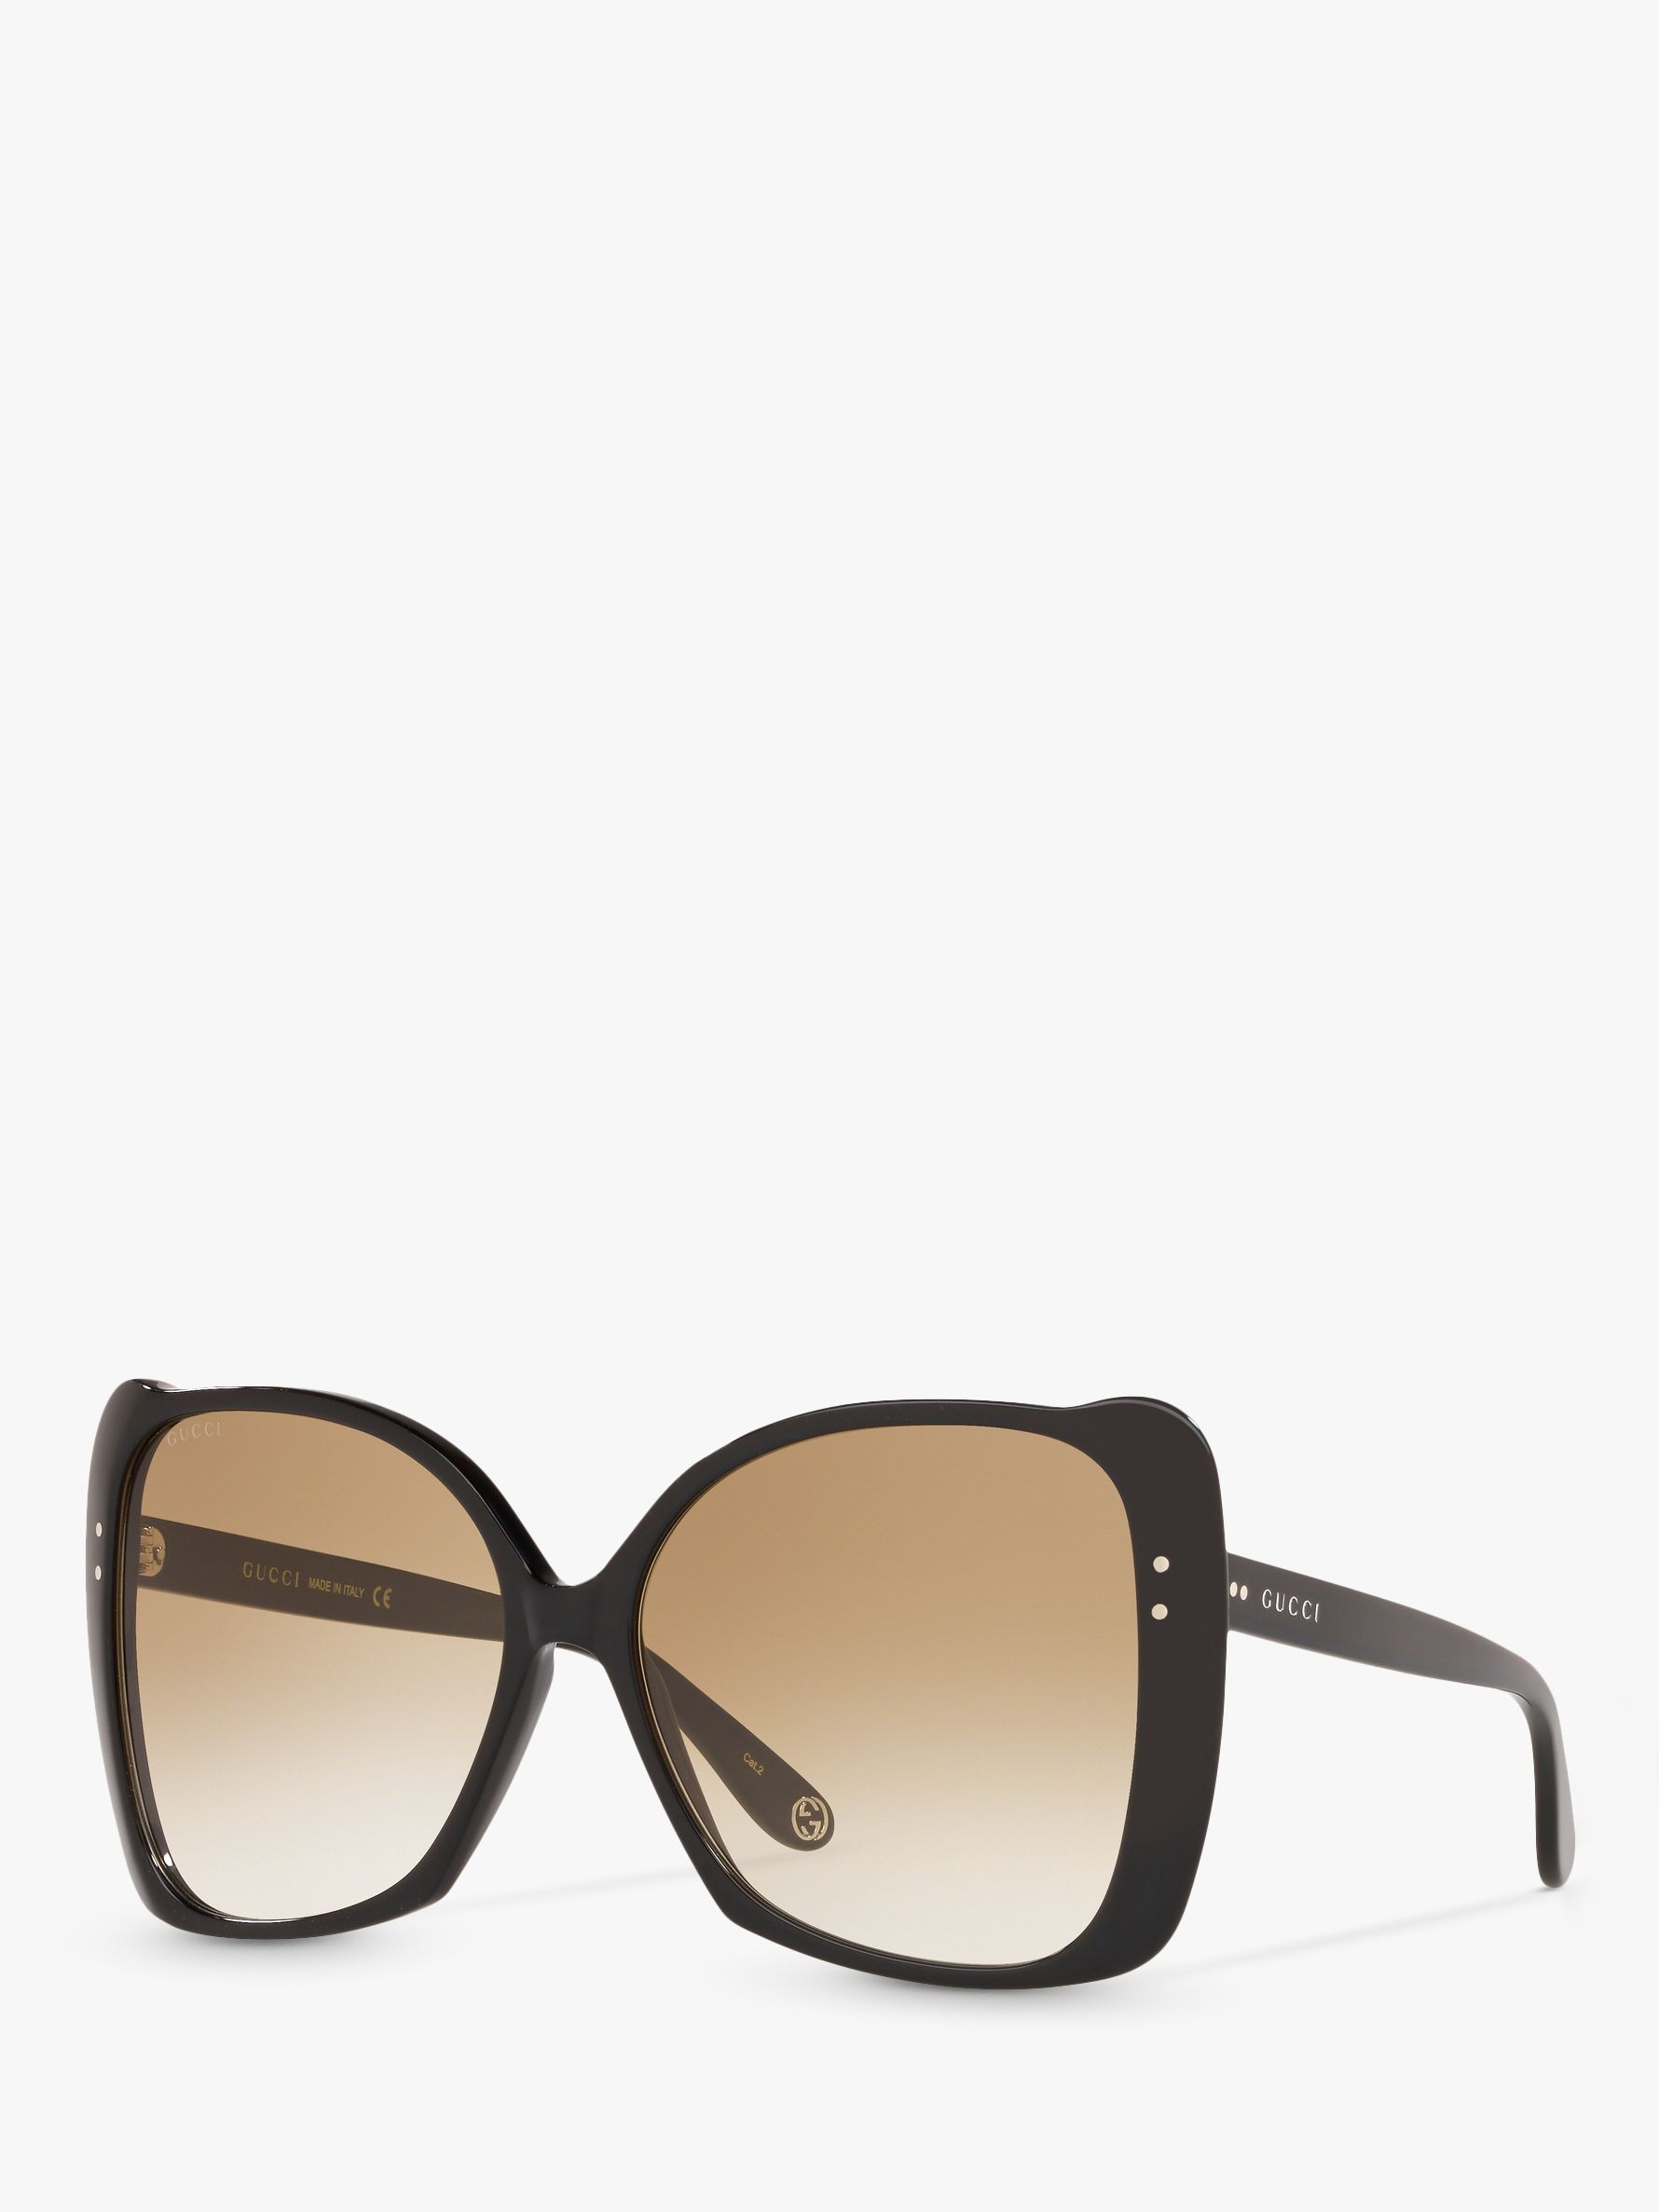 Gucci Gucci GG0471S Women's Butterfly Sunglasses